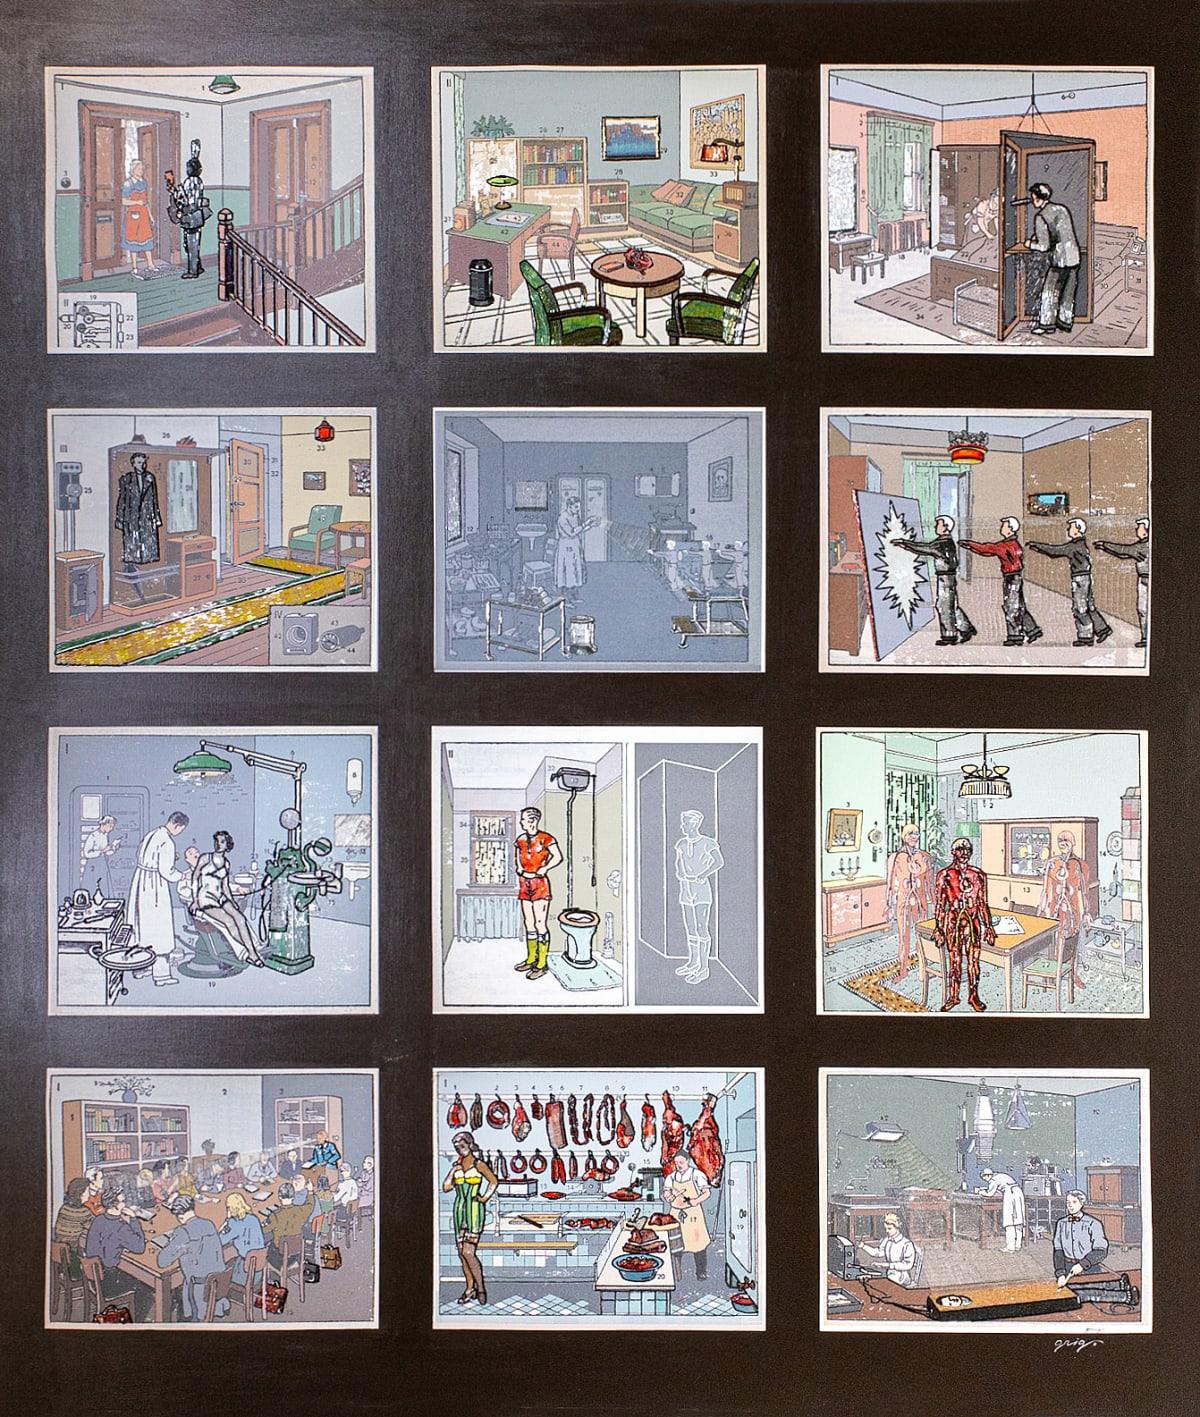 Vladimir Grig 13 ROOMS II • 13 КОМНАТ II, 2018 Canvas, acrylic, mosaic, print, glass beads Холст, акрил, мозаика, печать, стеклярус 79 1/2 x 67 3/4 in 202 x 172 cm Series: Stories in pictures • Рассказы в картинках